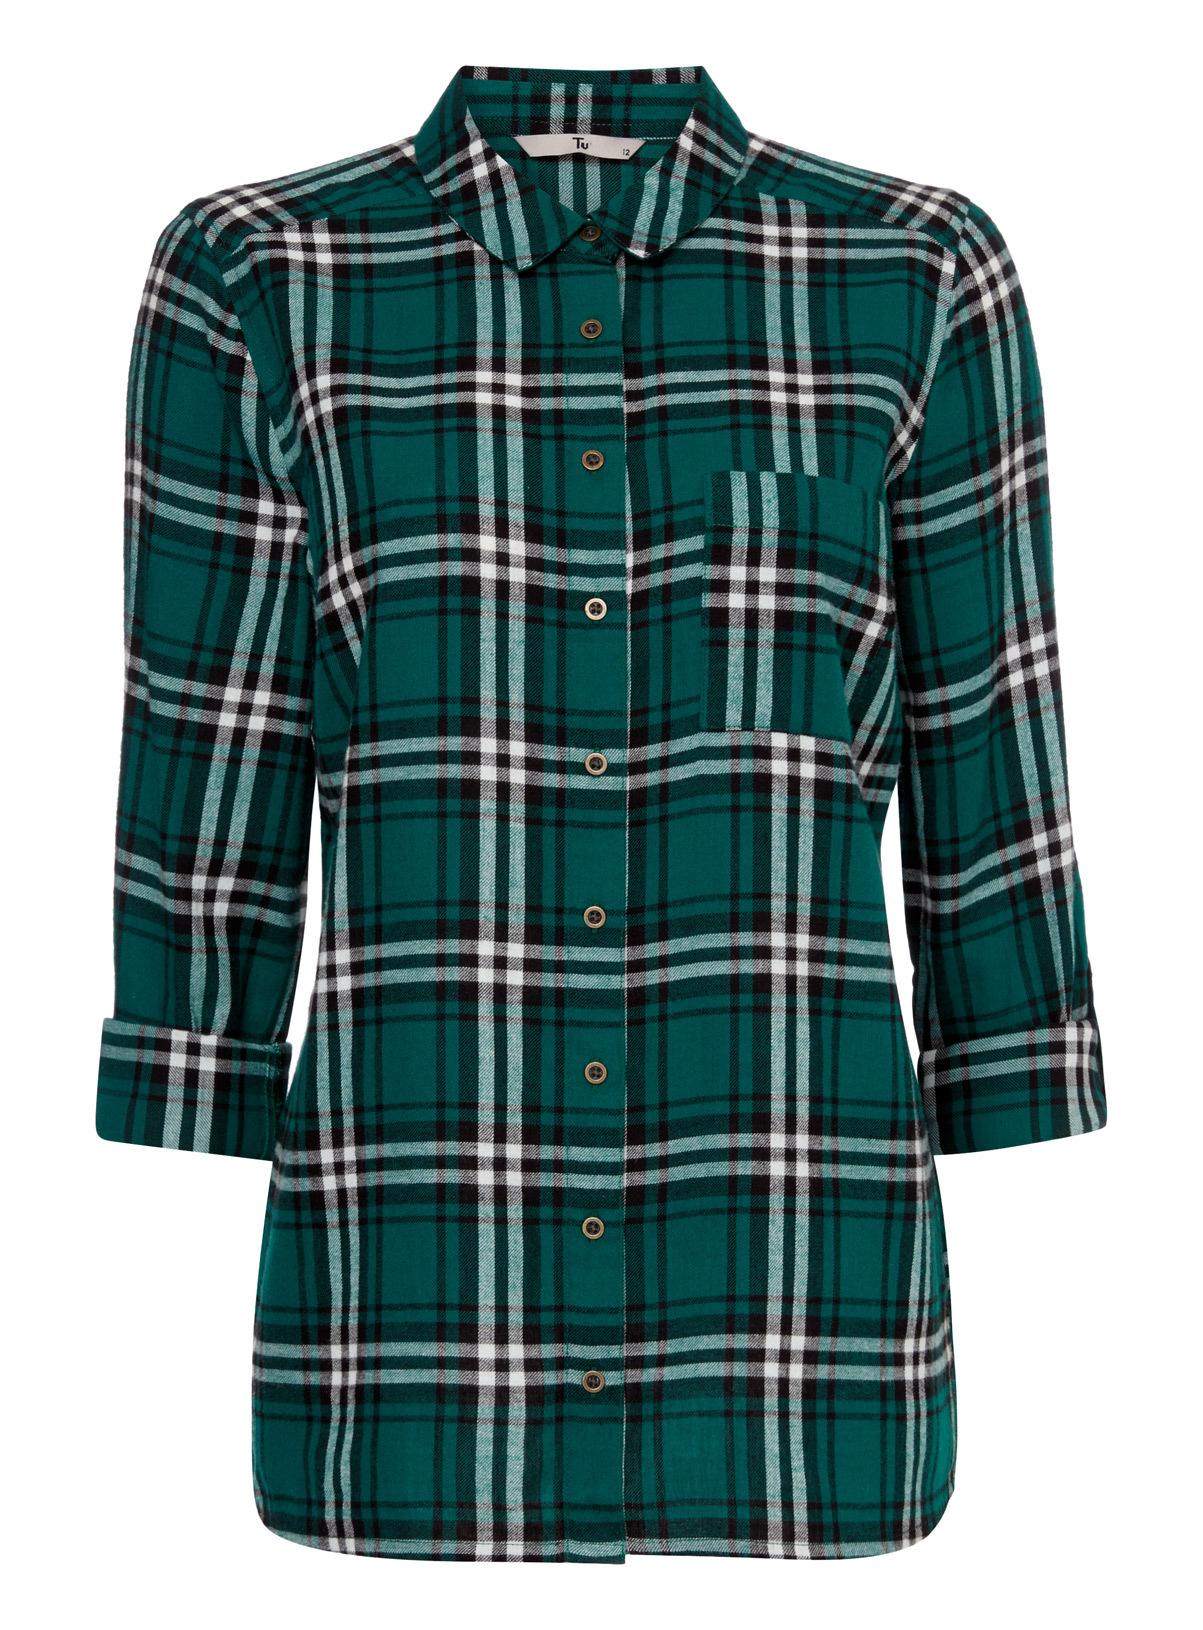 Womens Green Checked Shirt Custom Shirt